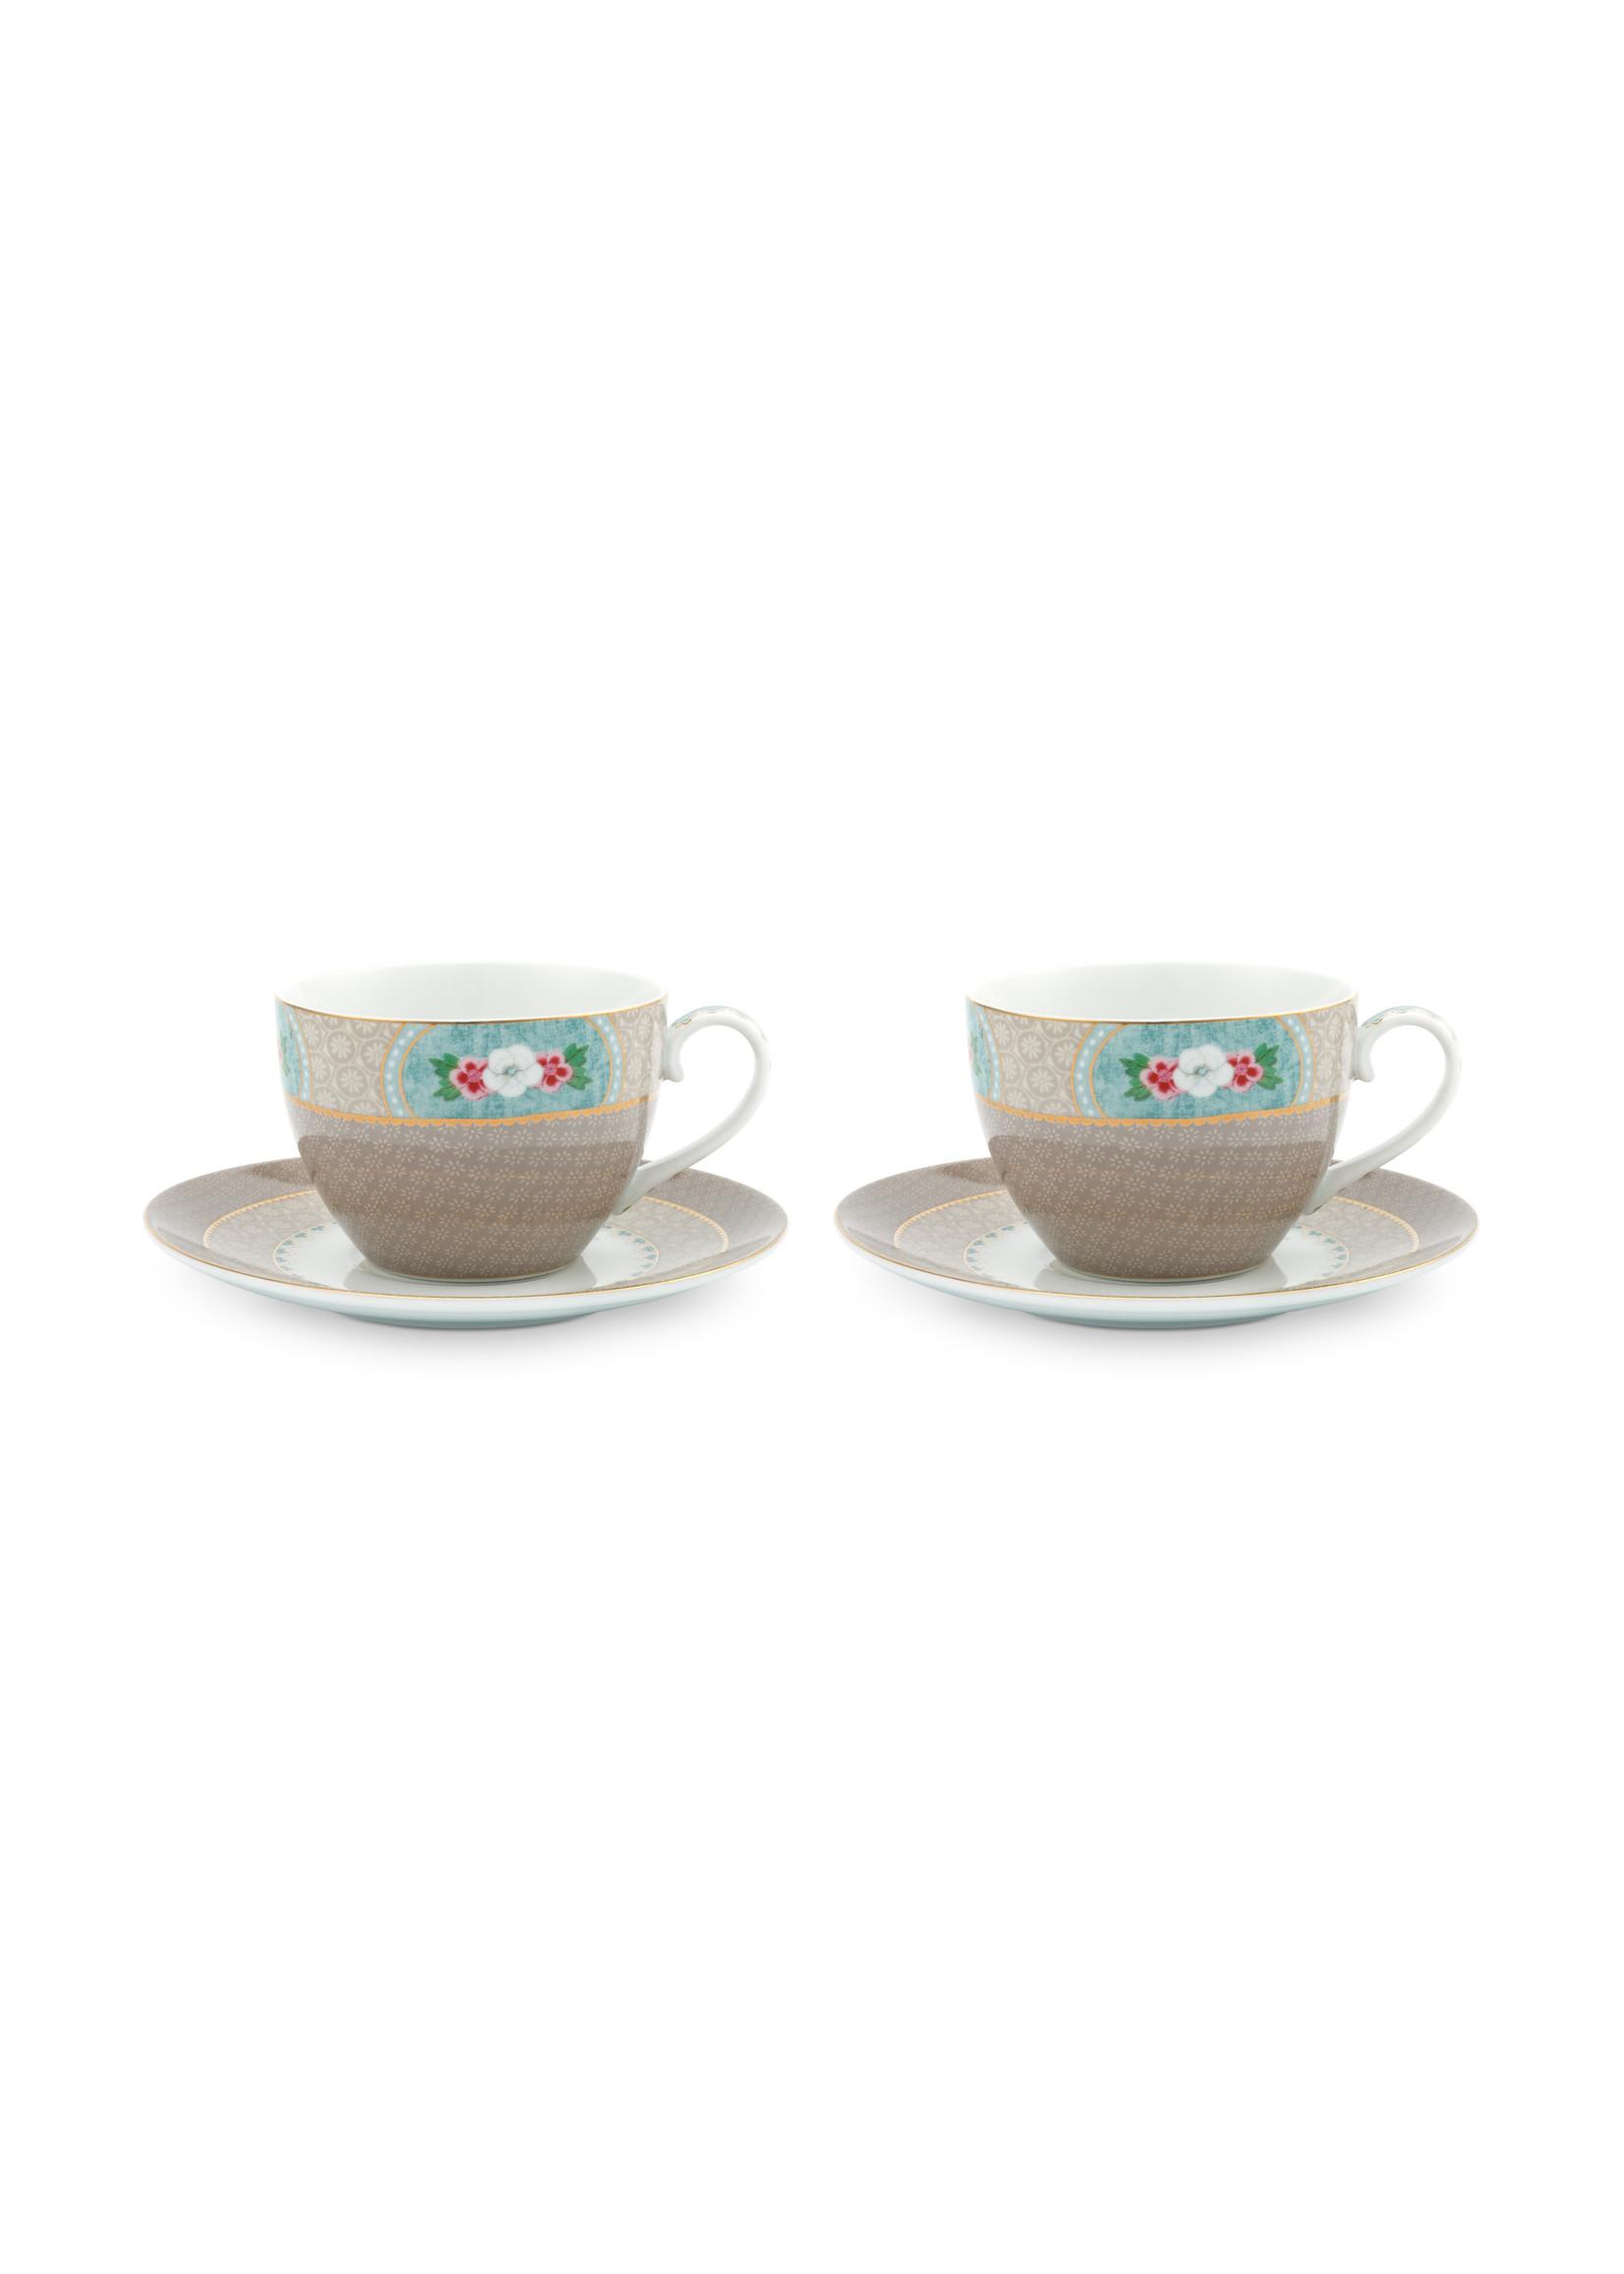 pip studio Set/2 Cups & Saucers Blushing Birds Khaki 280ml